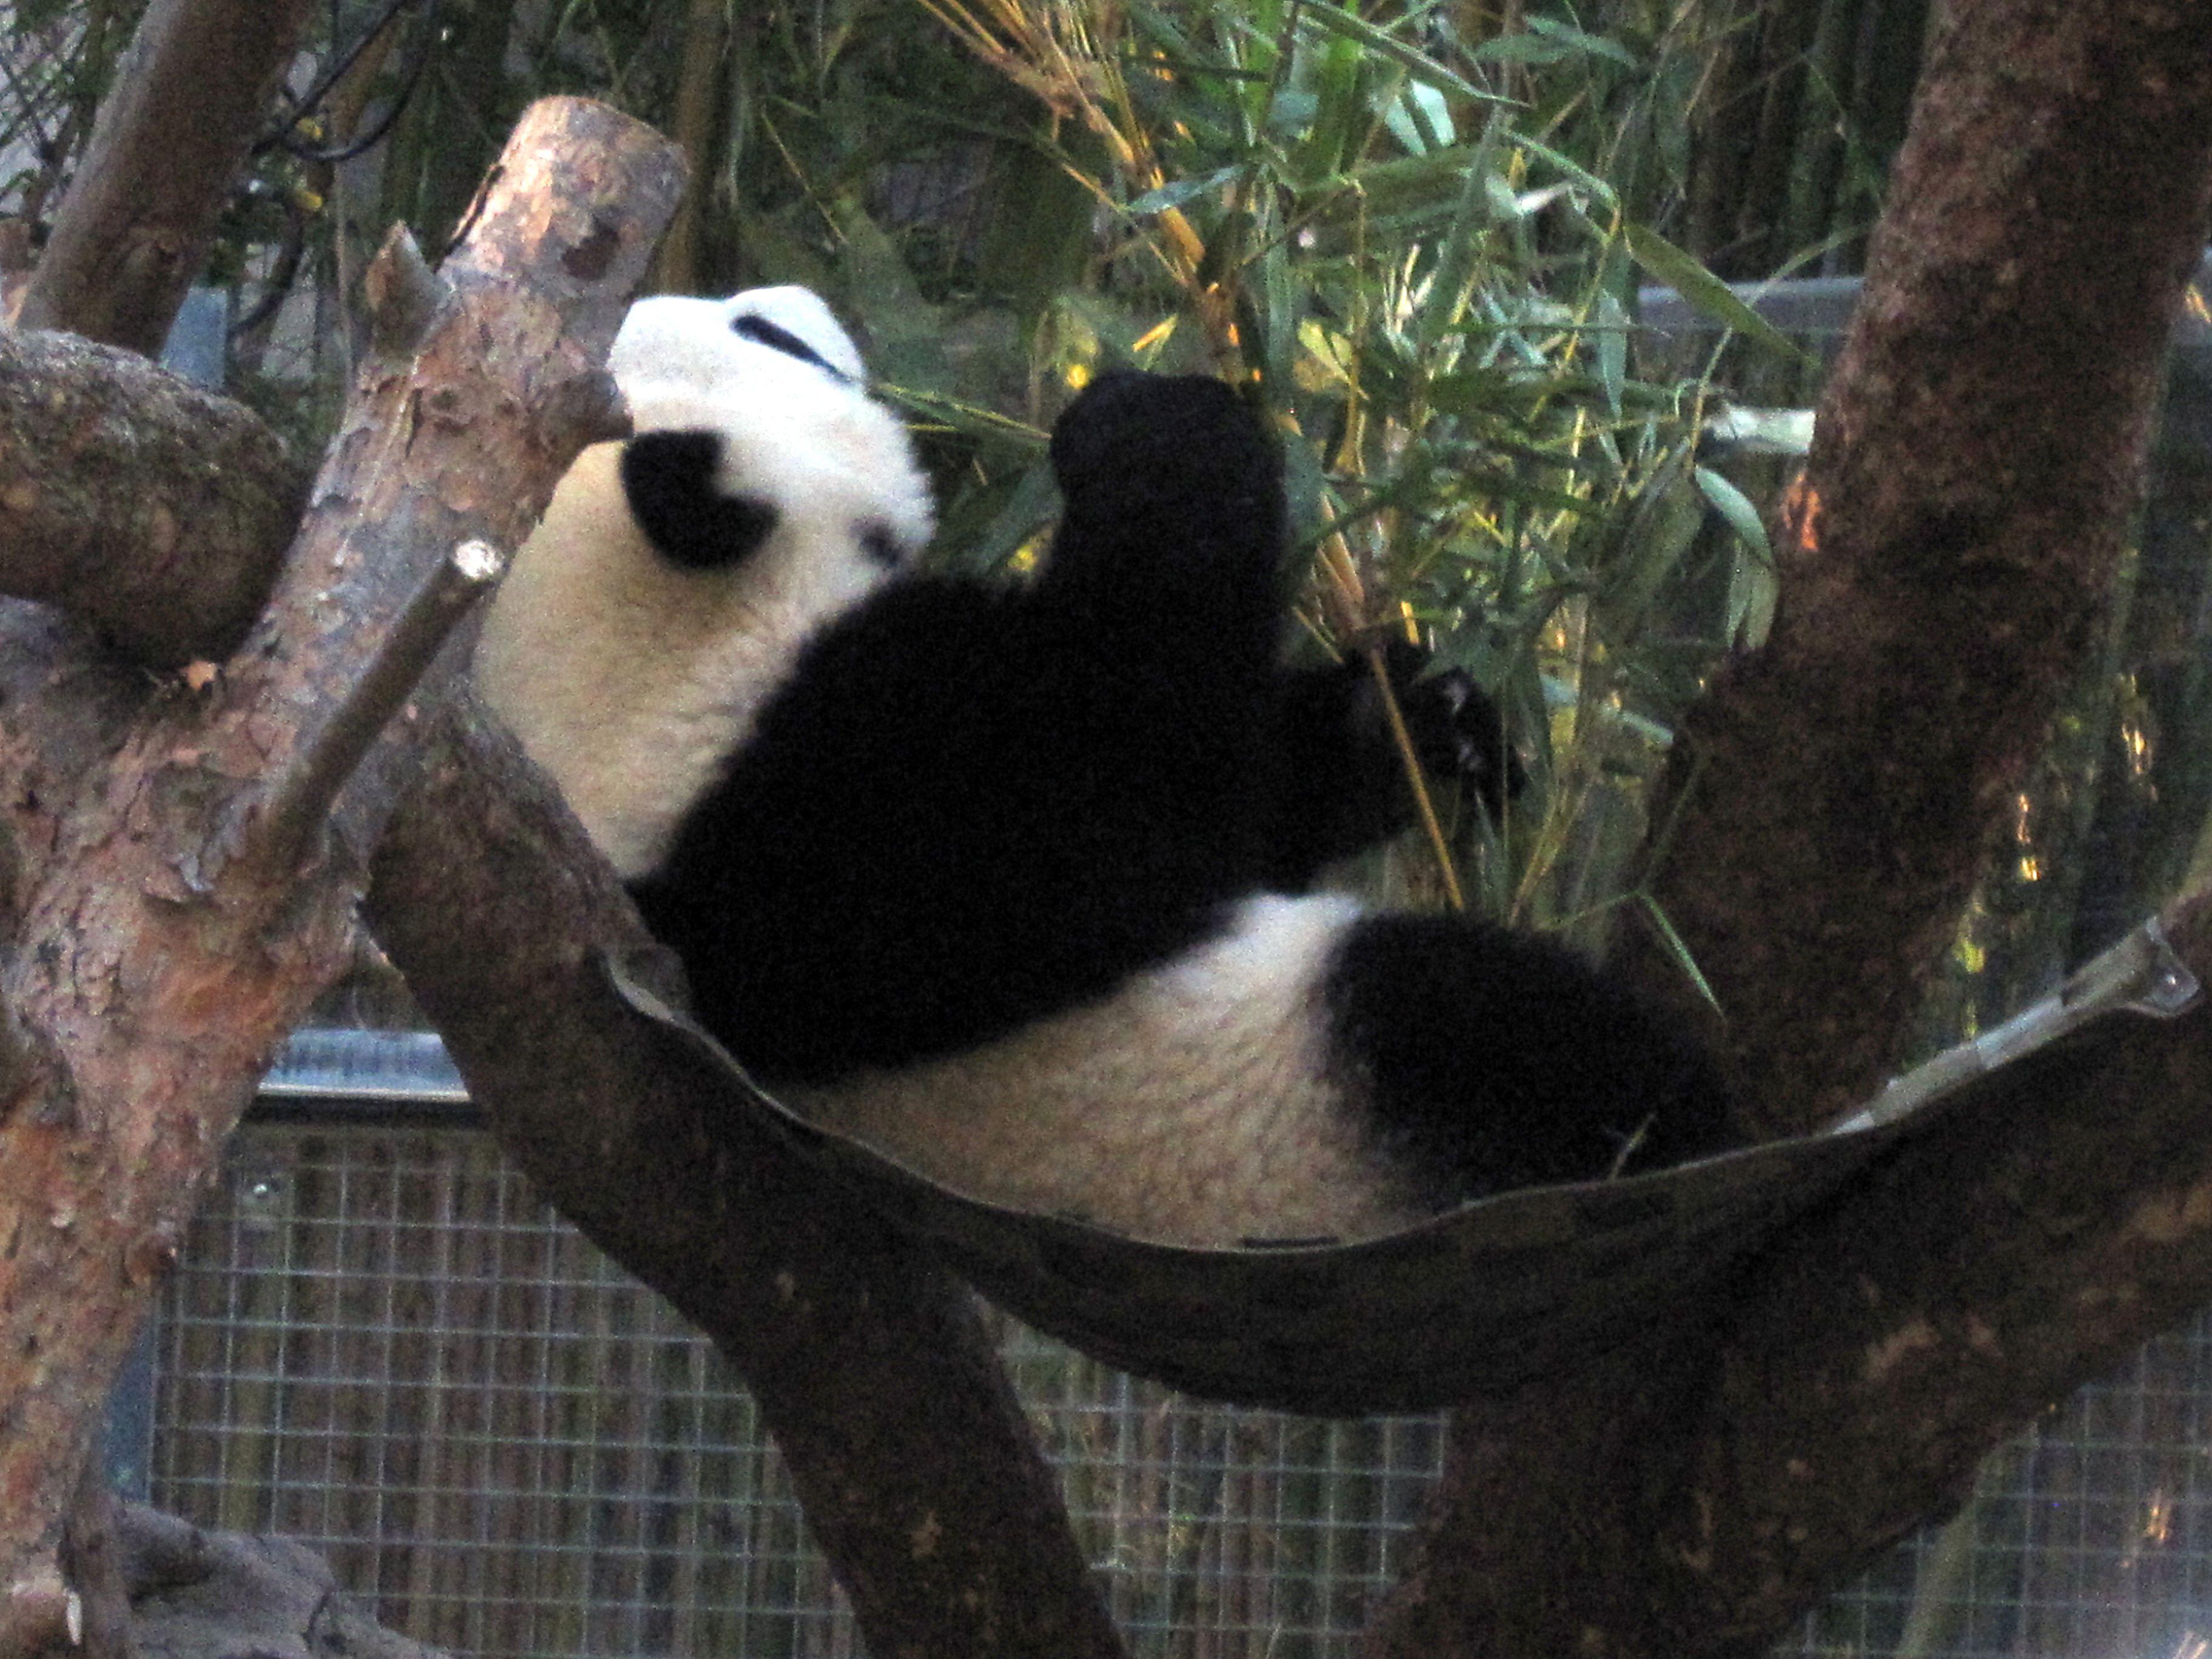 Life in a Hammock - Giant Panda @ San Diego Zoo